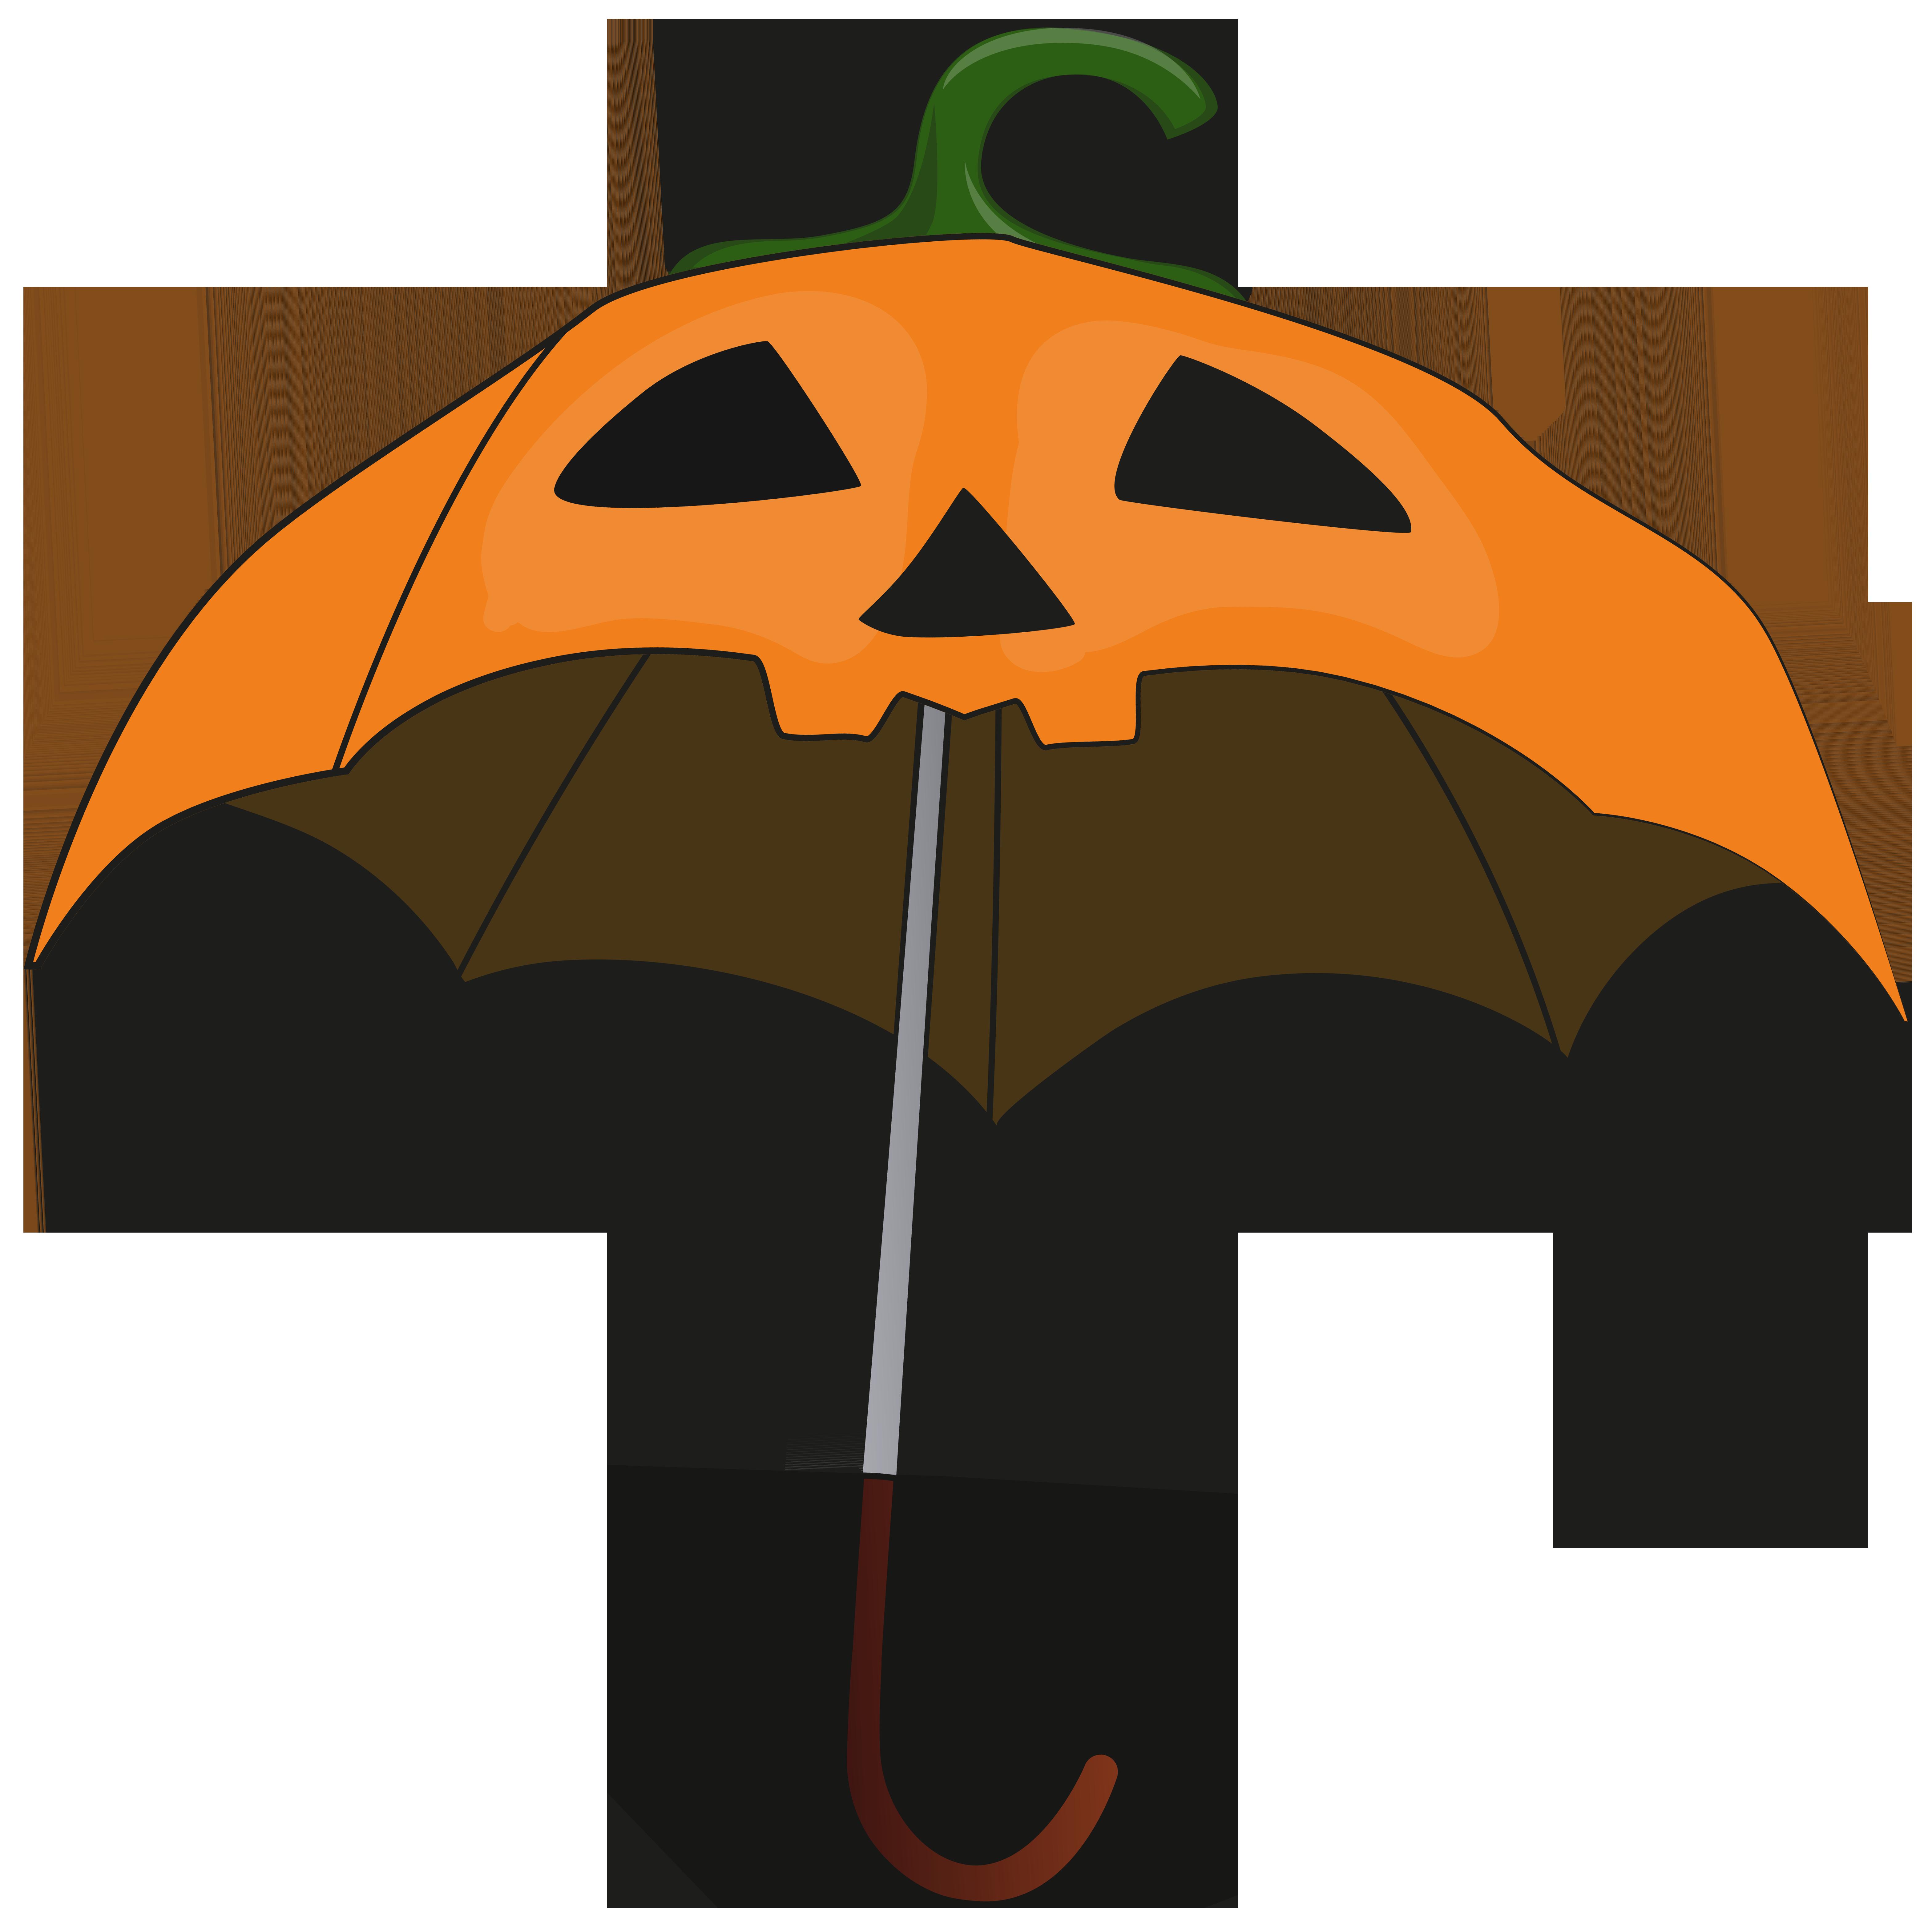 Halloween heart clipart png royalty free library Halloween Pumpkin Umbrella PNG Clip Art Image | Gallery ... png royalty free library